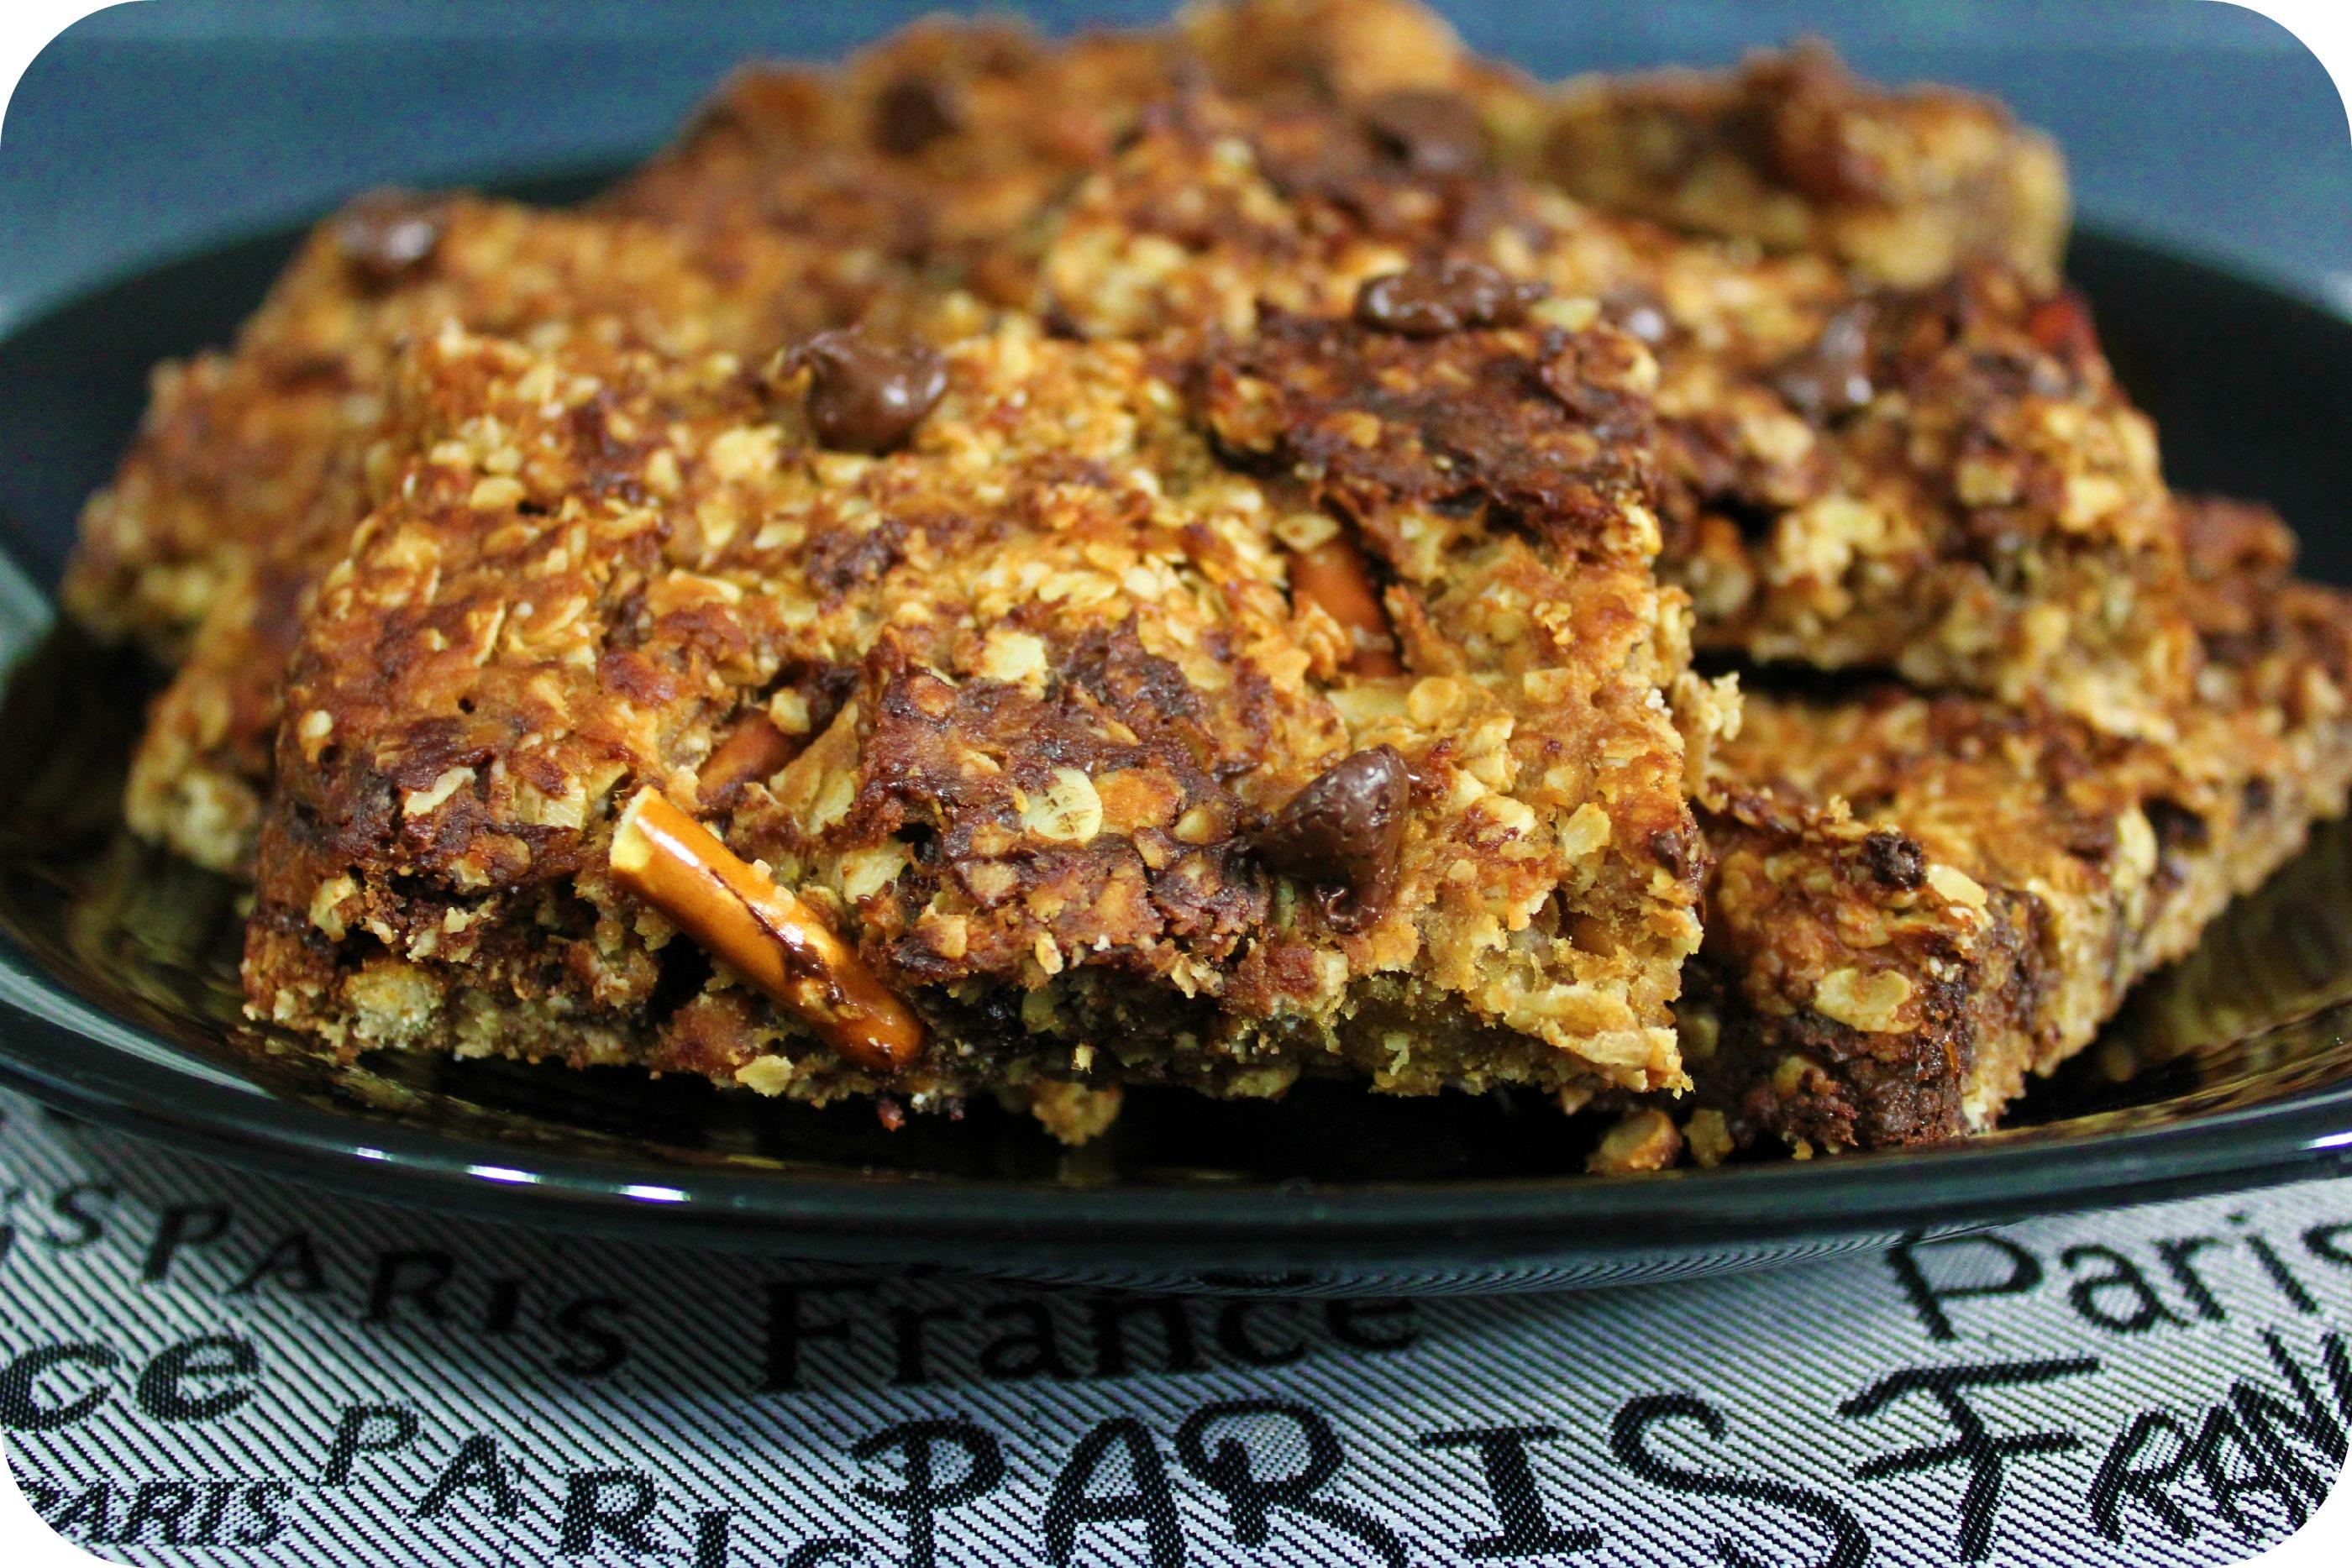 Snyder's of Hanover's Organic Trail Bars Recipe